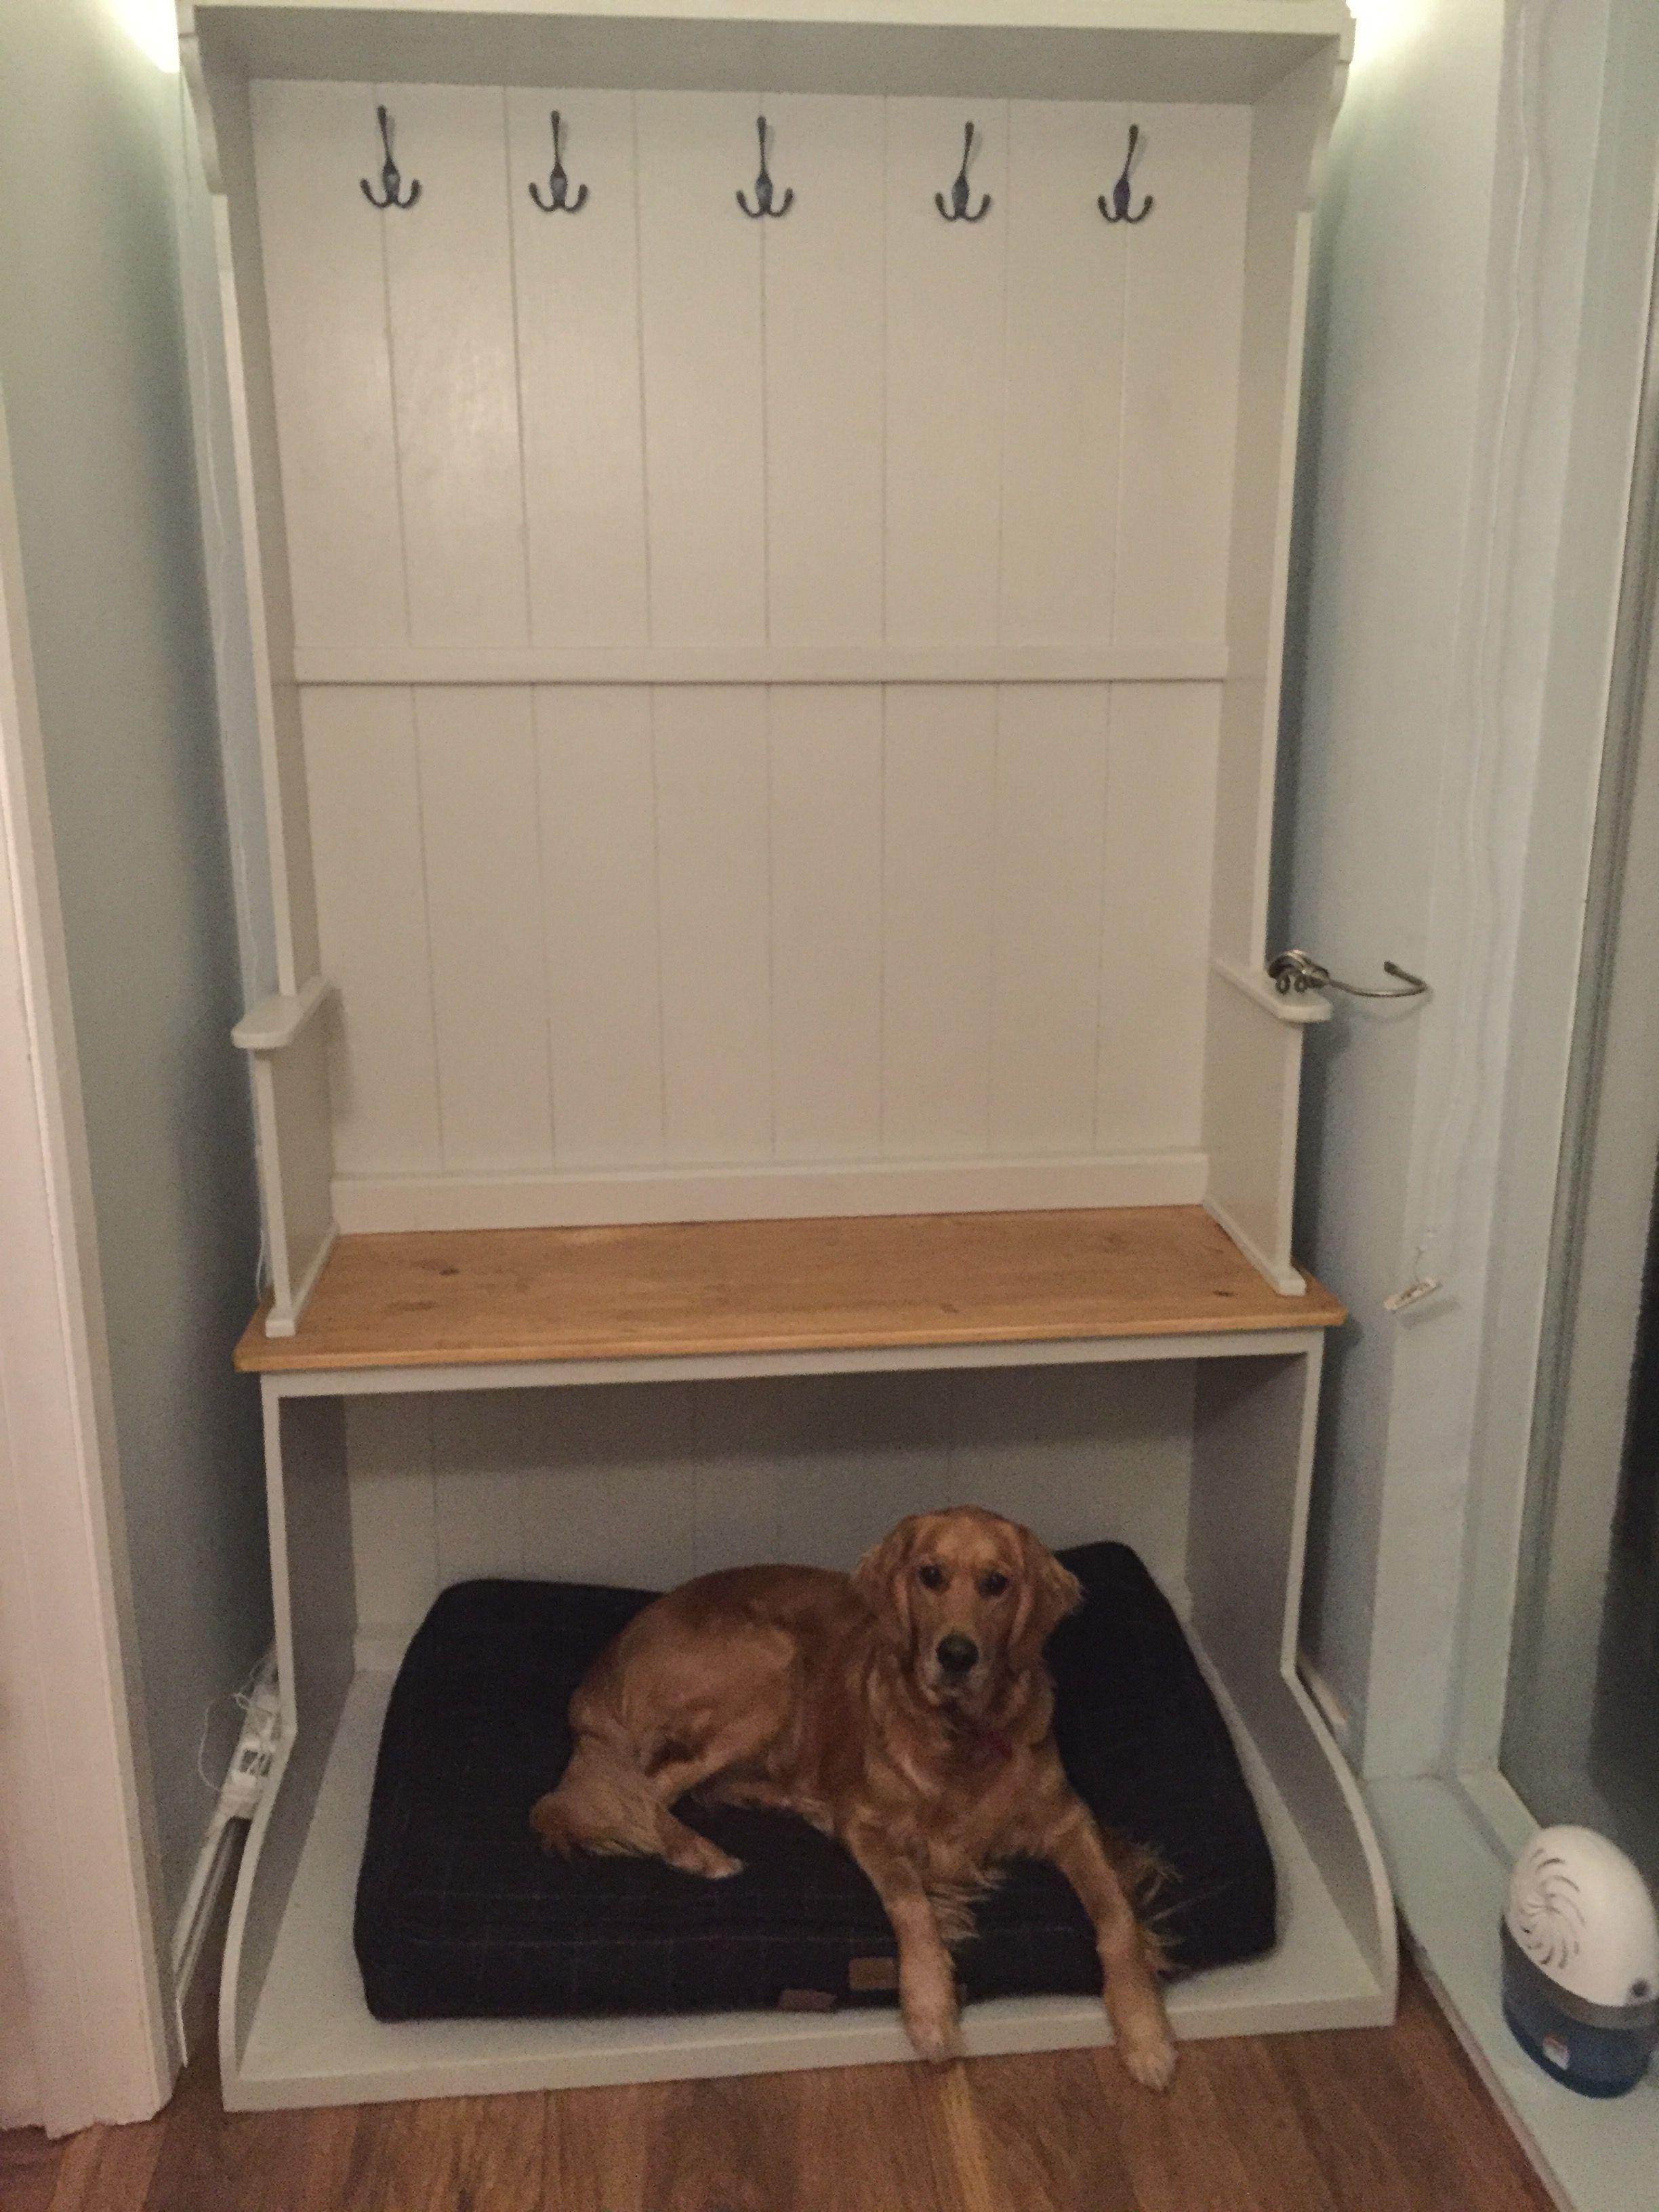 Strange Monk Bench Dog Bed In 2019 Dog Bed Monks Bench Mudroom Uwap Interior Chair Design Uwaporg